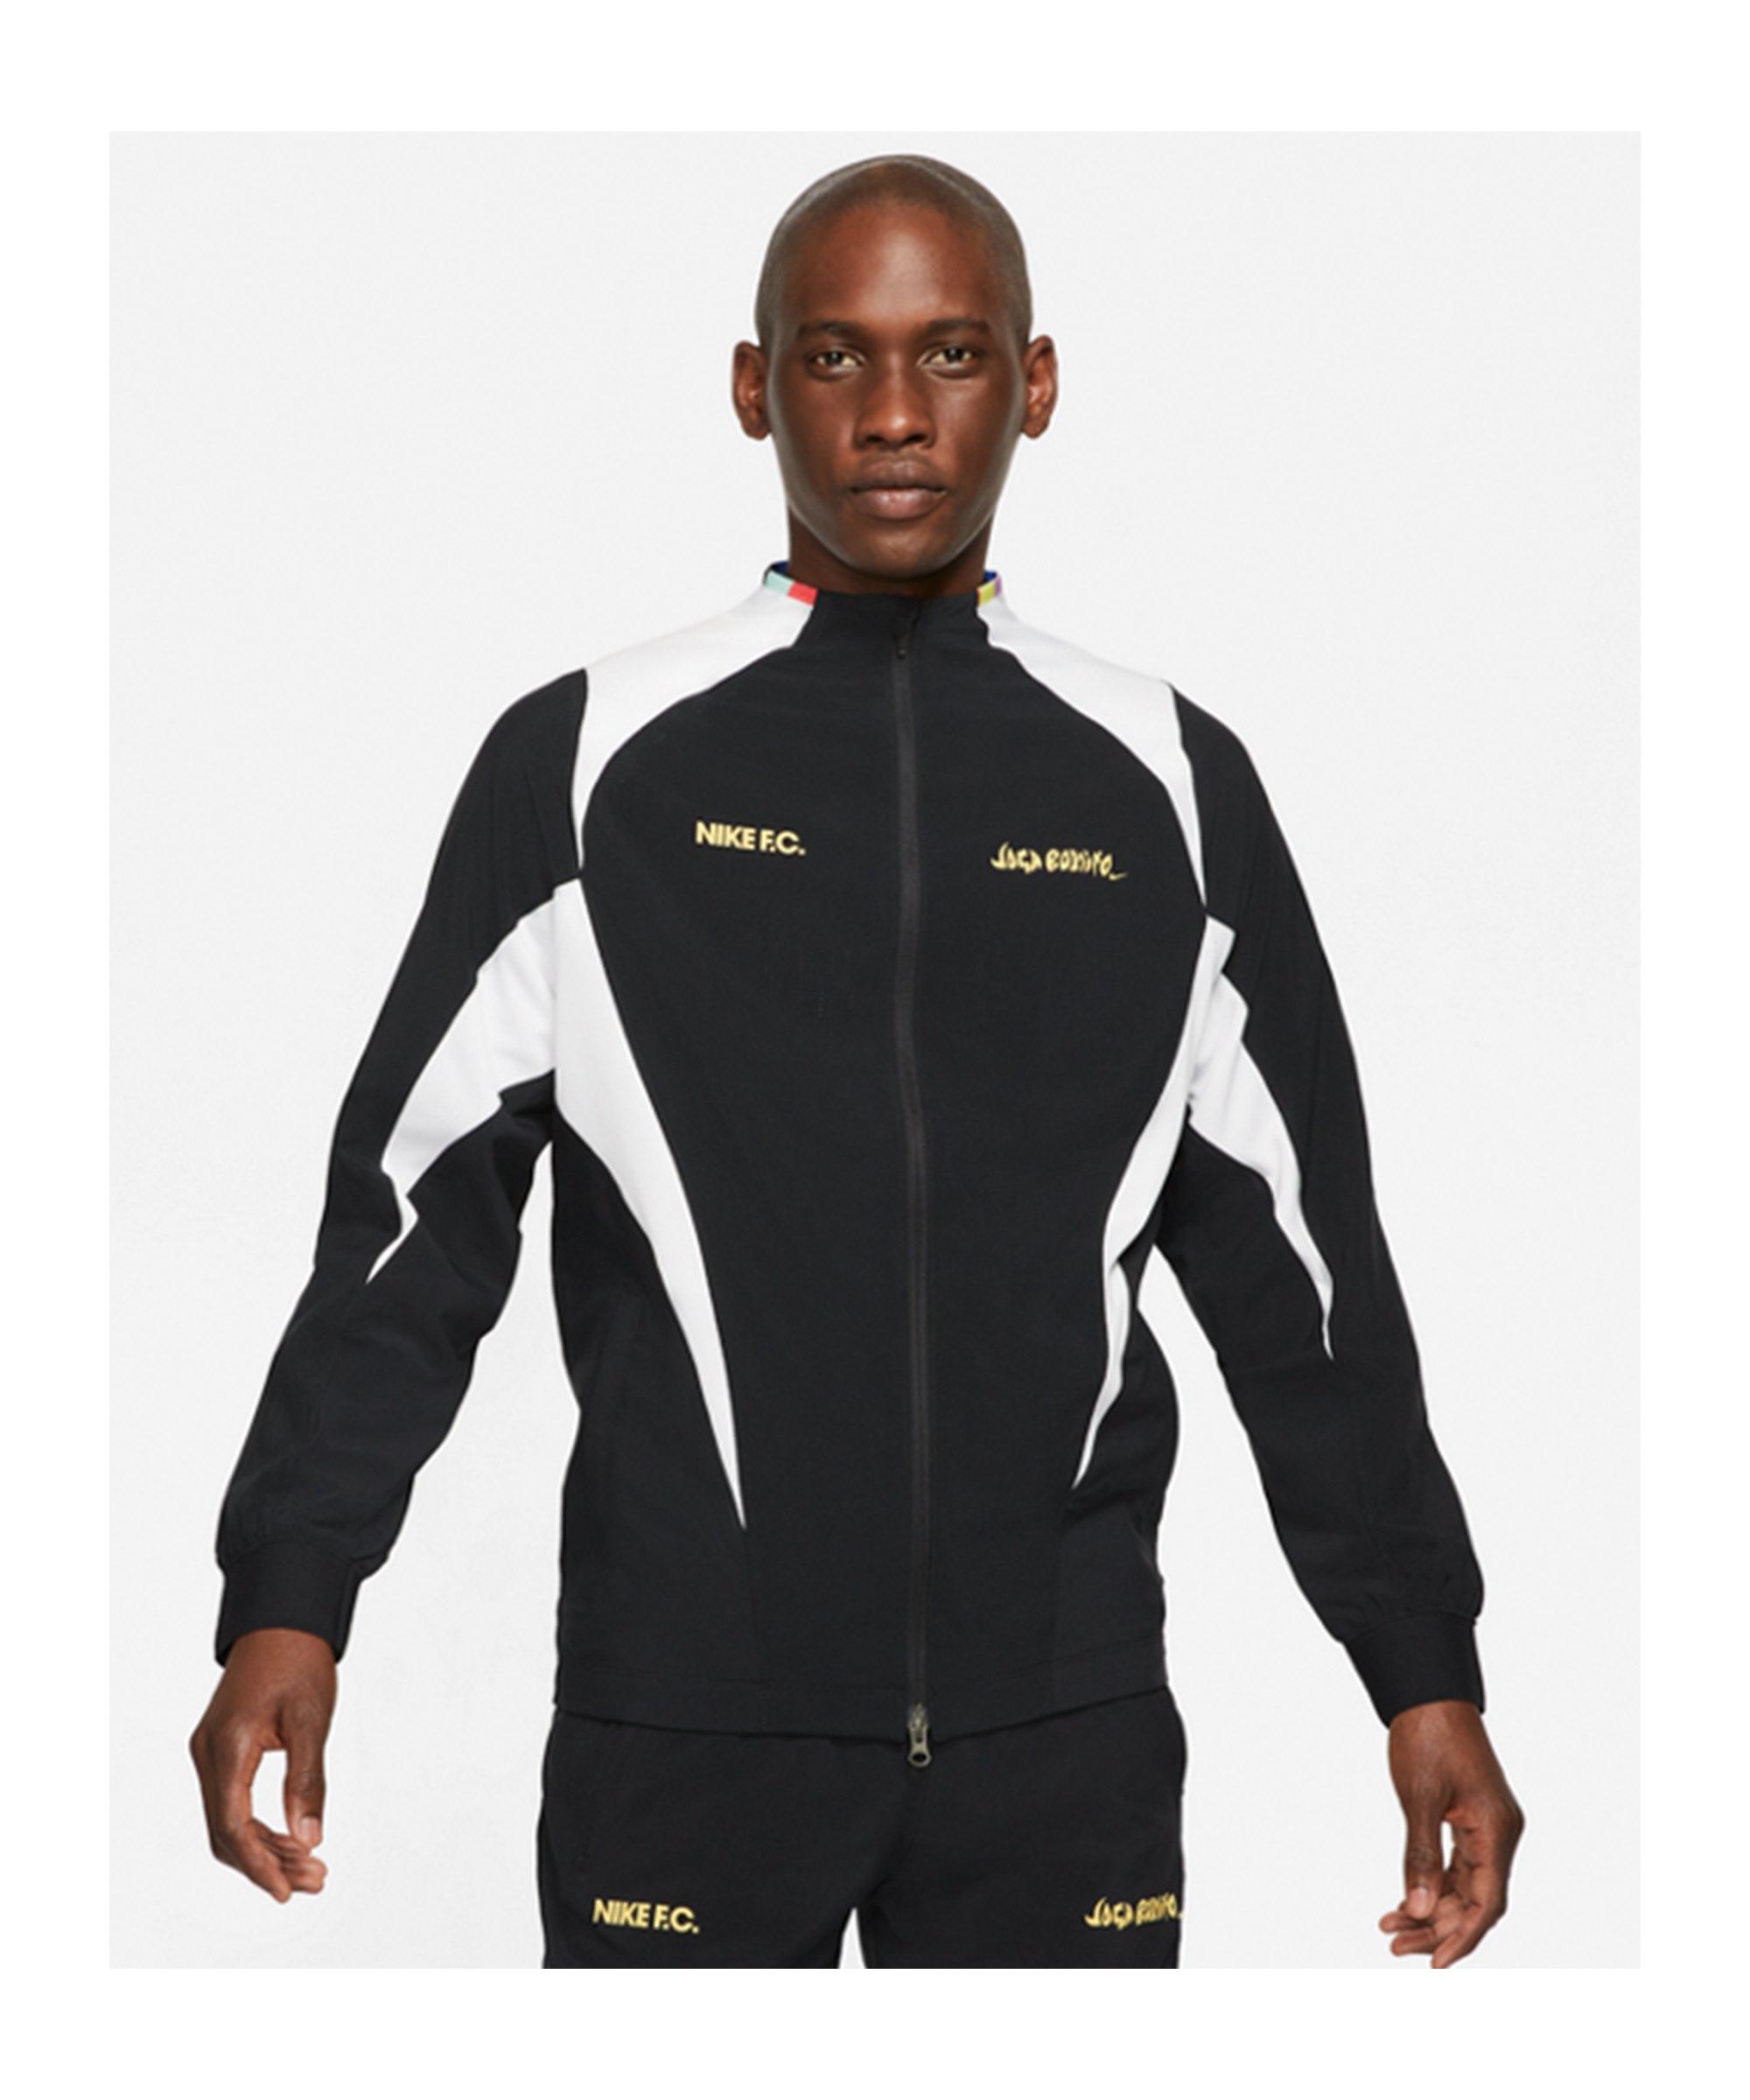 Nike F.C. Joga Bonito Woven Jacke Schwarz F010 - schwarz